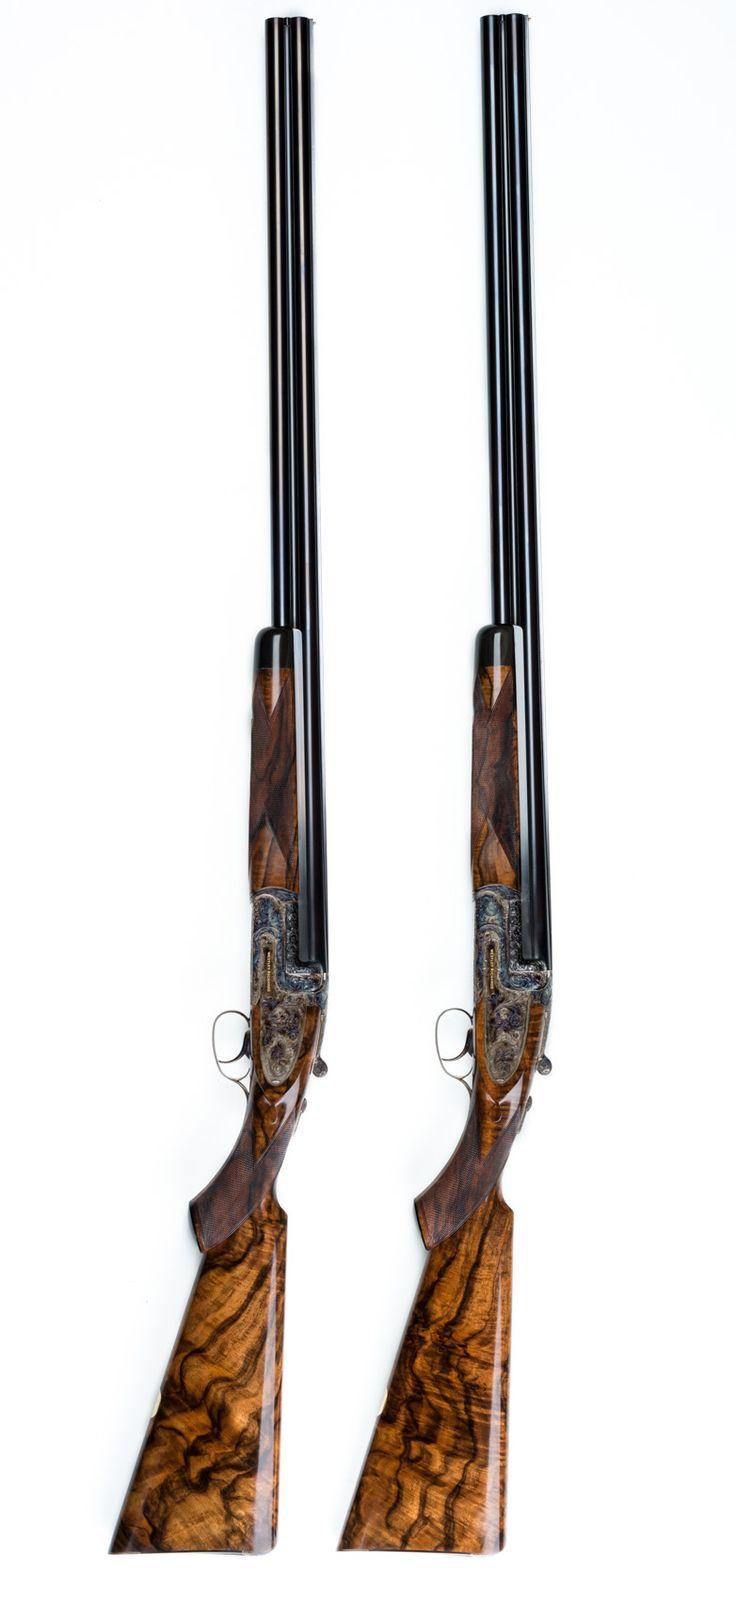 Pair of Westley Richards 20g 'Ovundo' Single Selective Trigger Droplock Shotguns